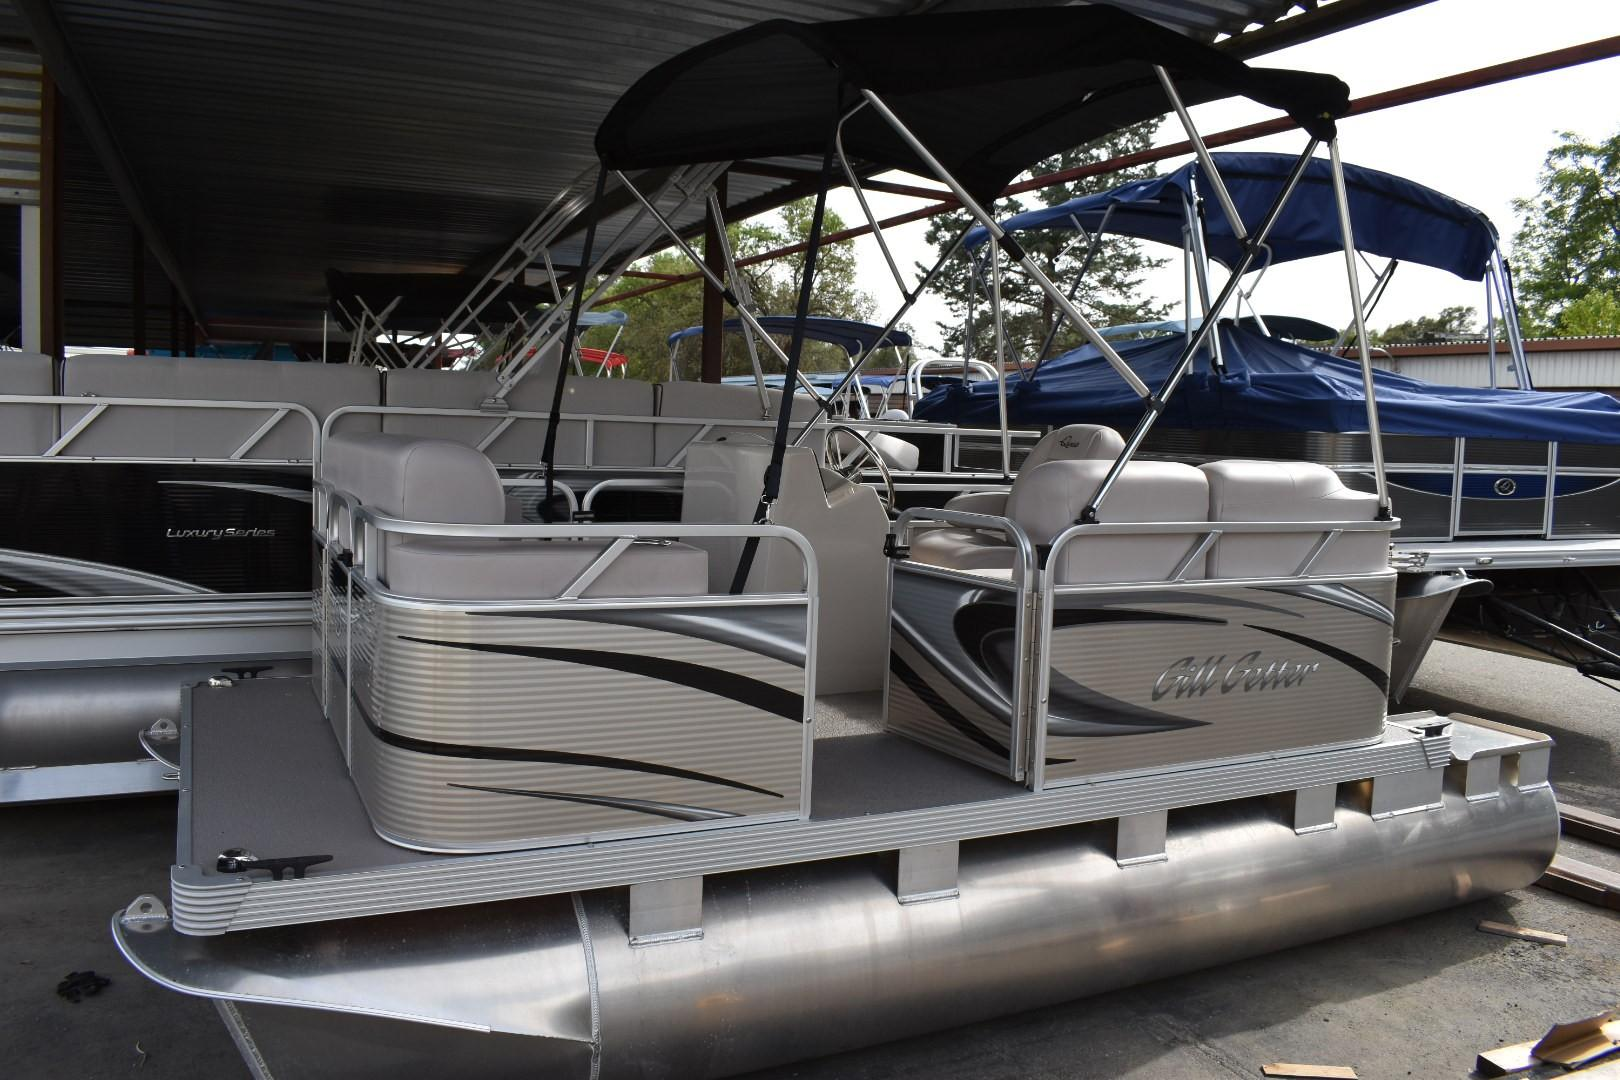 2018 Qwest GIllGetter 613 Tiller, Loomis California - boats.com